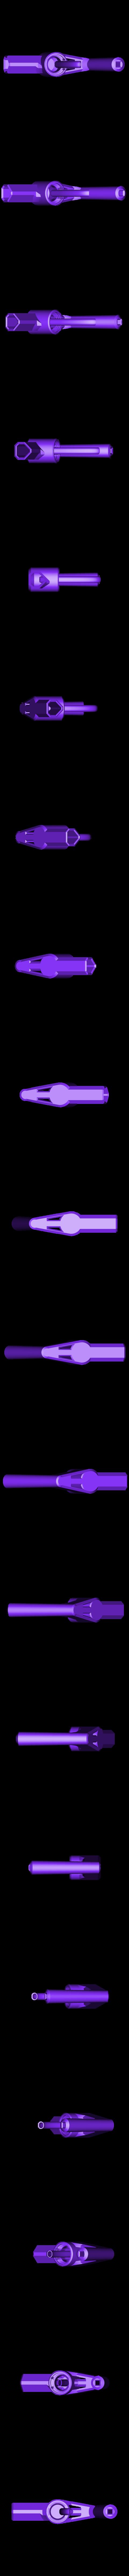 petkanne.stl Download free STL file PET-Kanne • 3D printer template, Ghashnarb